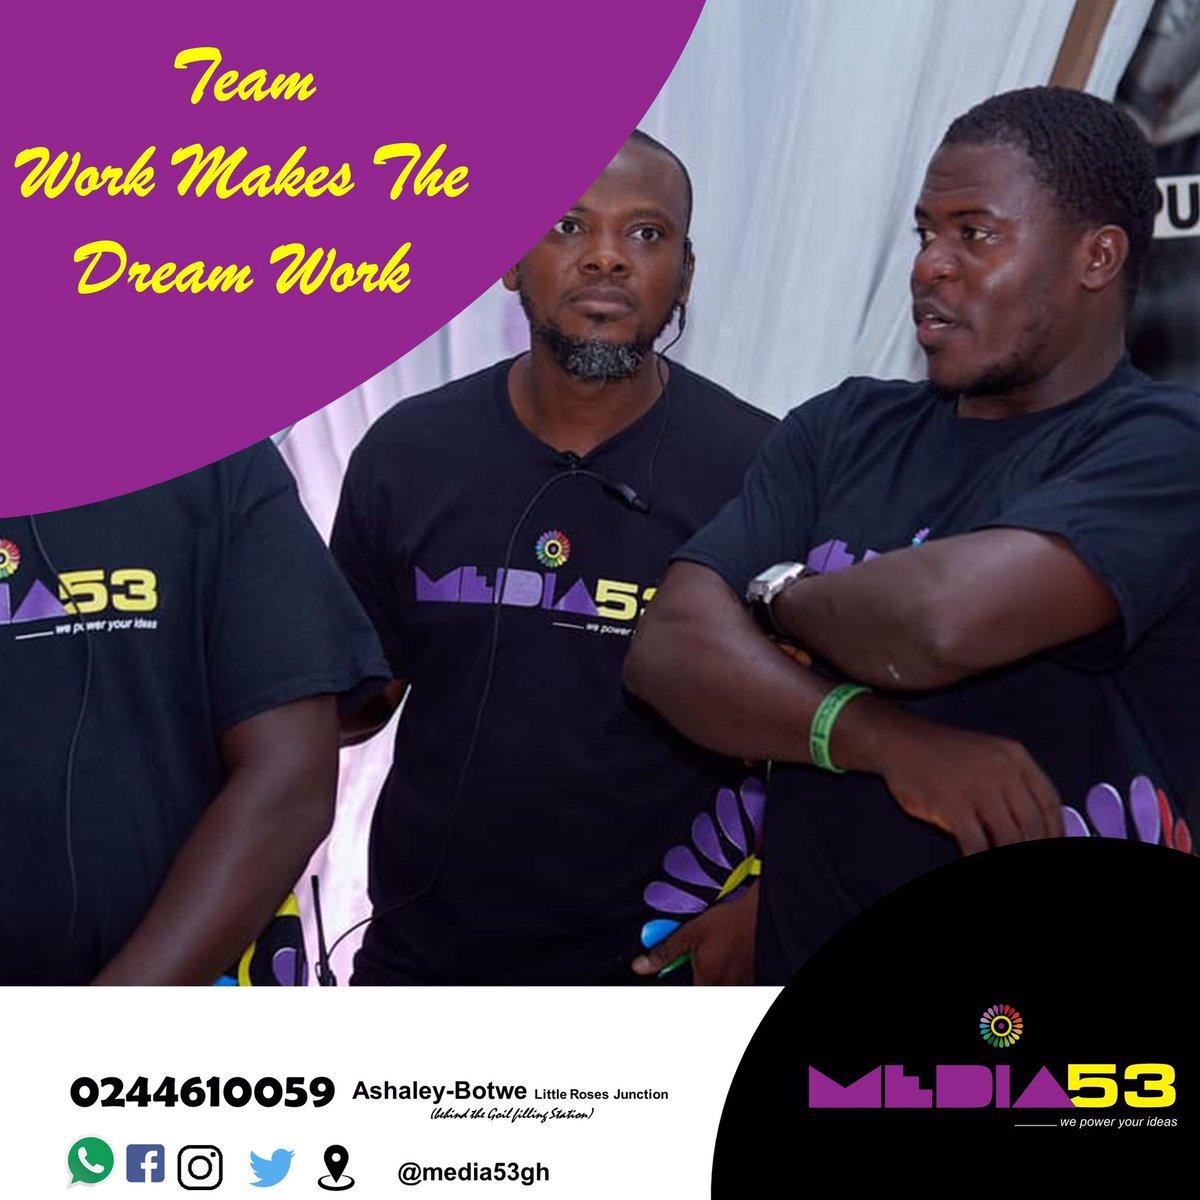 We do this together. Call or Whatsup 0244610059 #Media53gh.             #ghanawedding.            #GhanaNews.                           #media.                            #productions.                          #events #crymerecords #Ghanamusic #Hiplife #Kasahara #Africanmusic https://t.co/VQr4I1JIDU